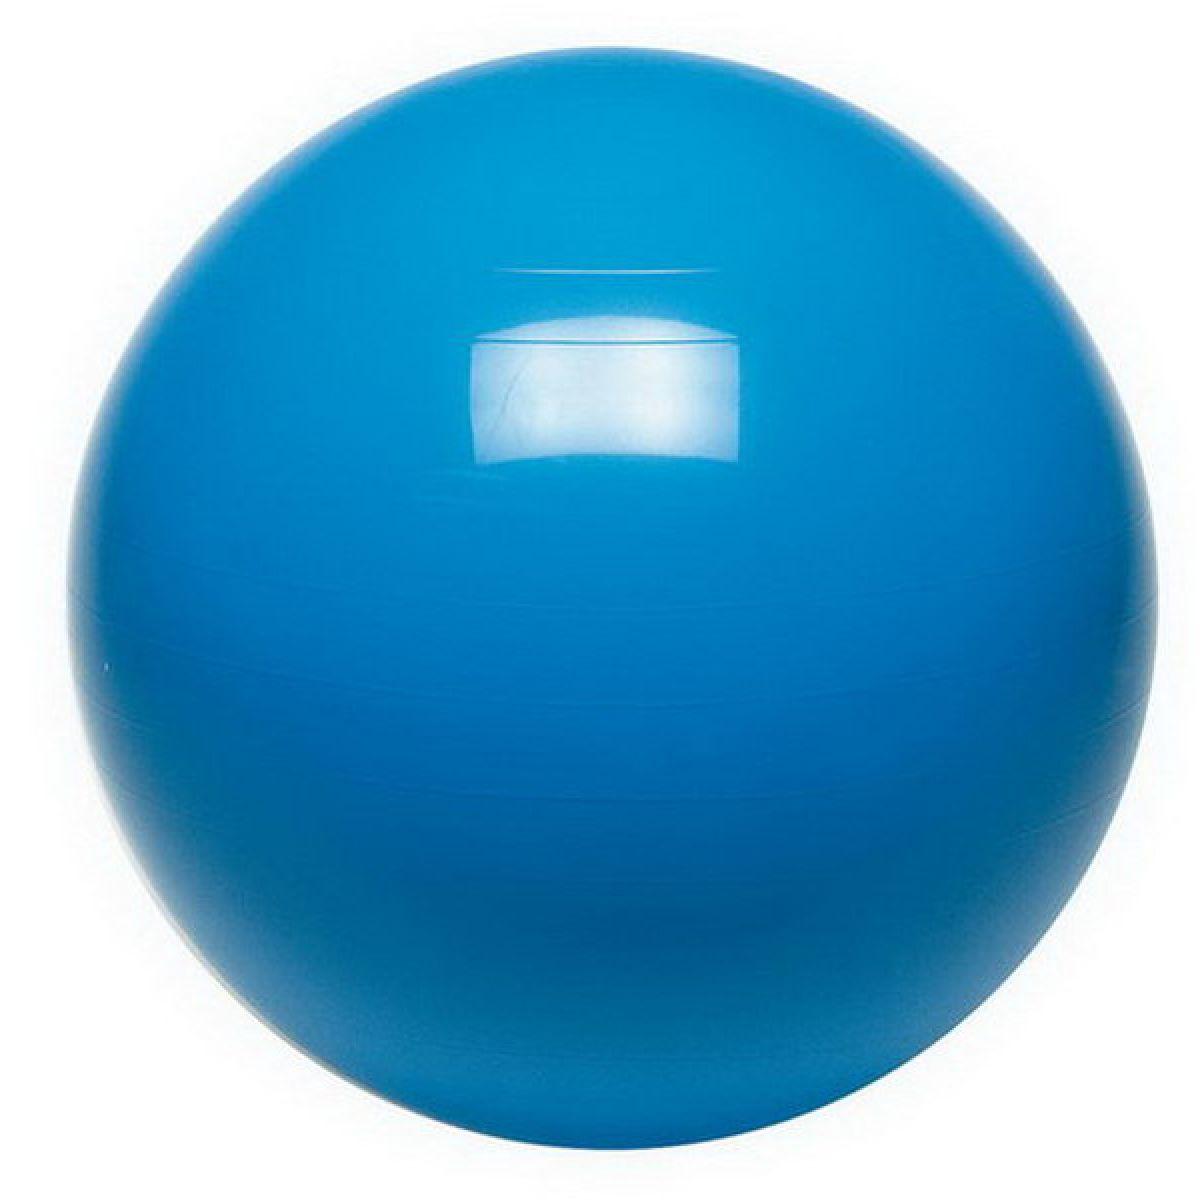 John Gymnastický míč Standart 75cm